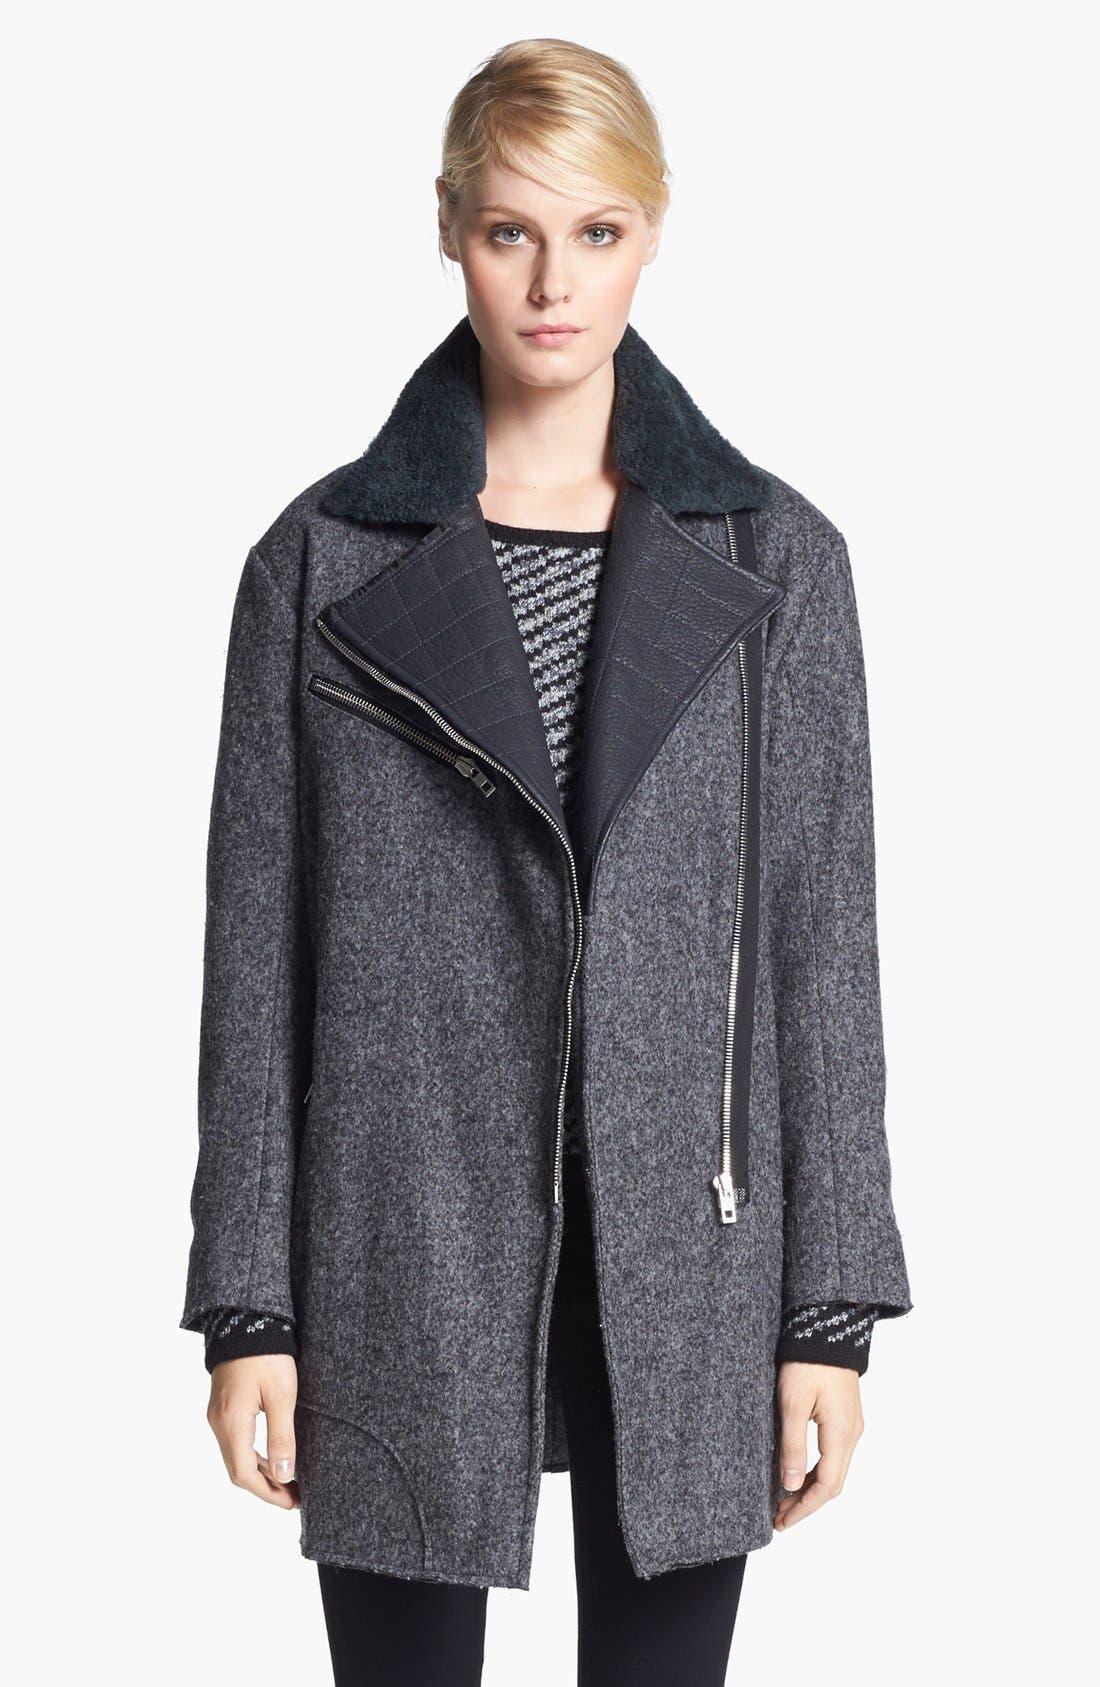 Alternate Image 1 Selected - rag & bone 'Turner' Genuine Shearling & Leather Collar Coat